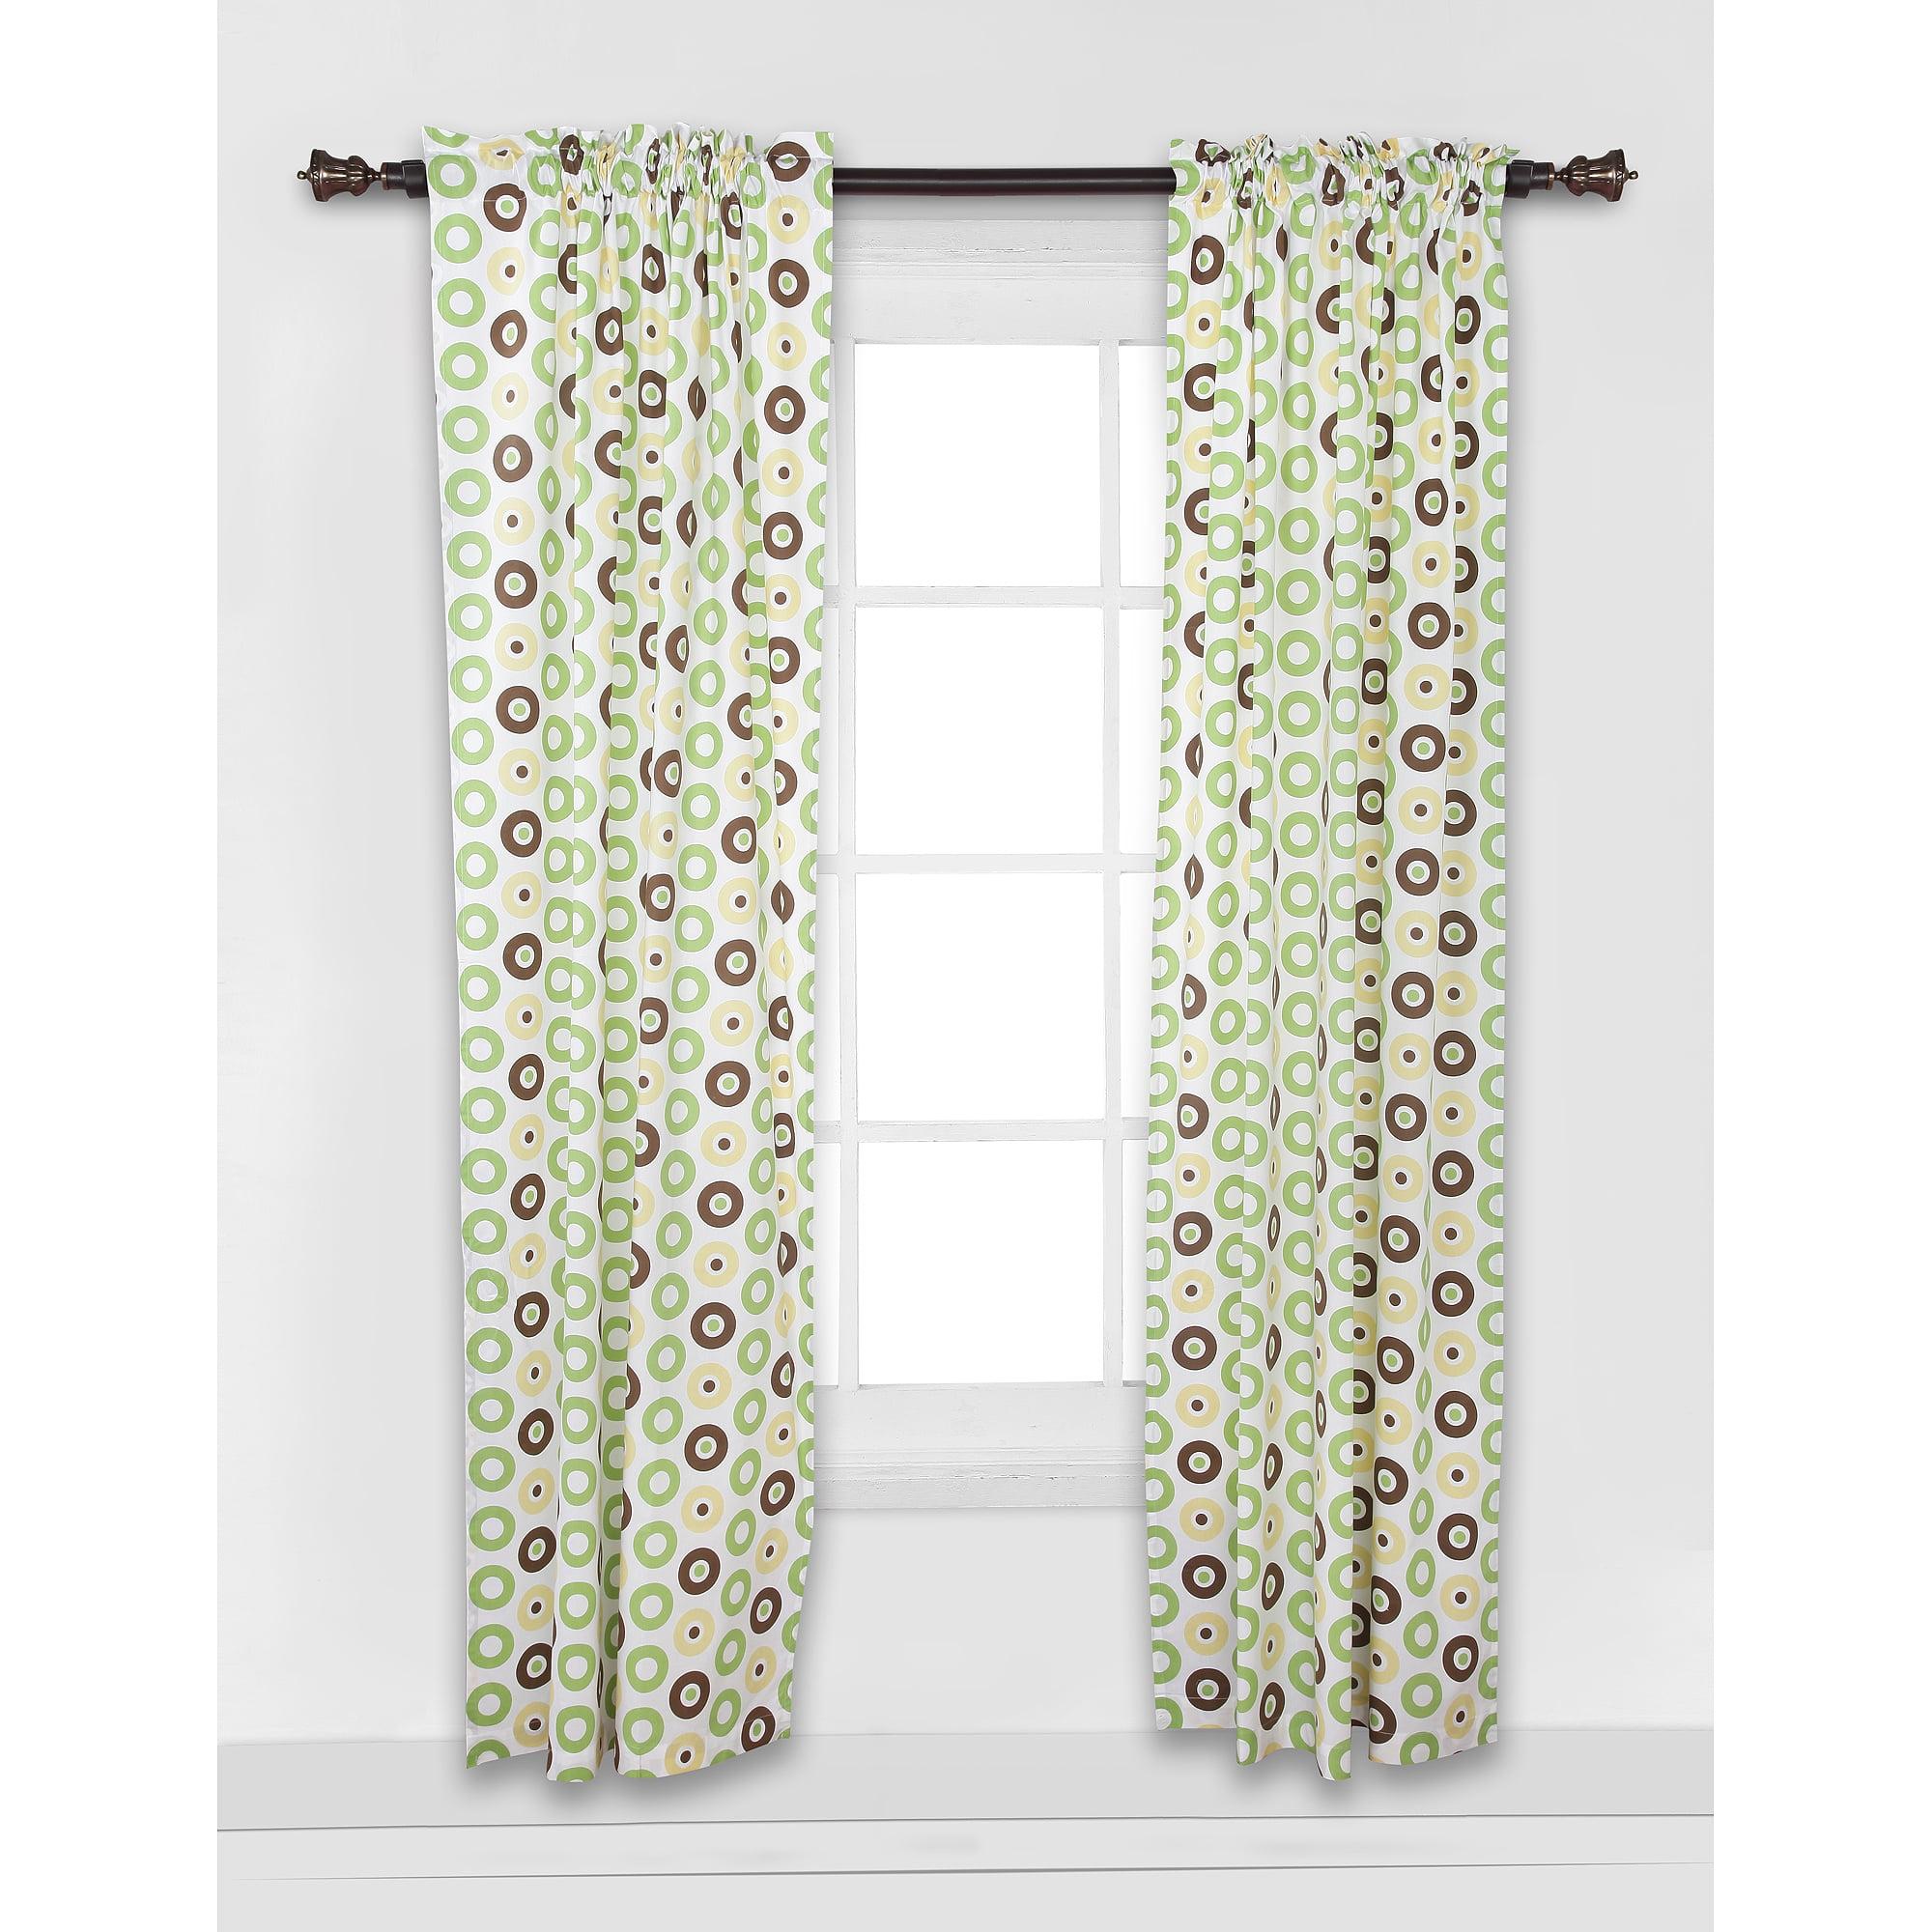 "Bacati Mod Dots Curtain Panel 42""x84"" 100% Cotton percale fabrics, Green and Chocolate"